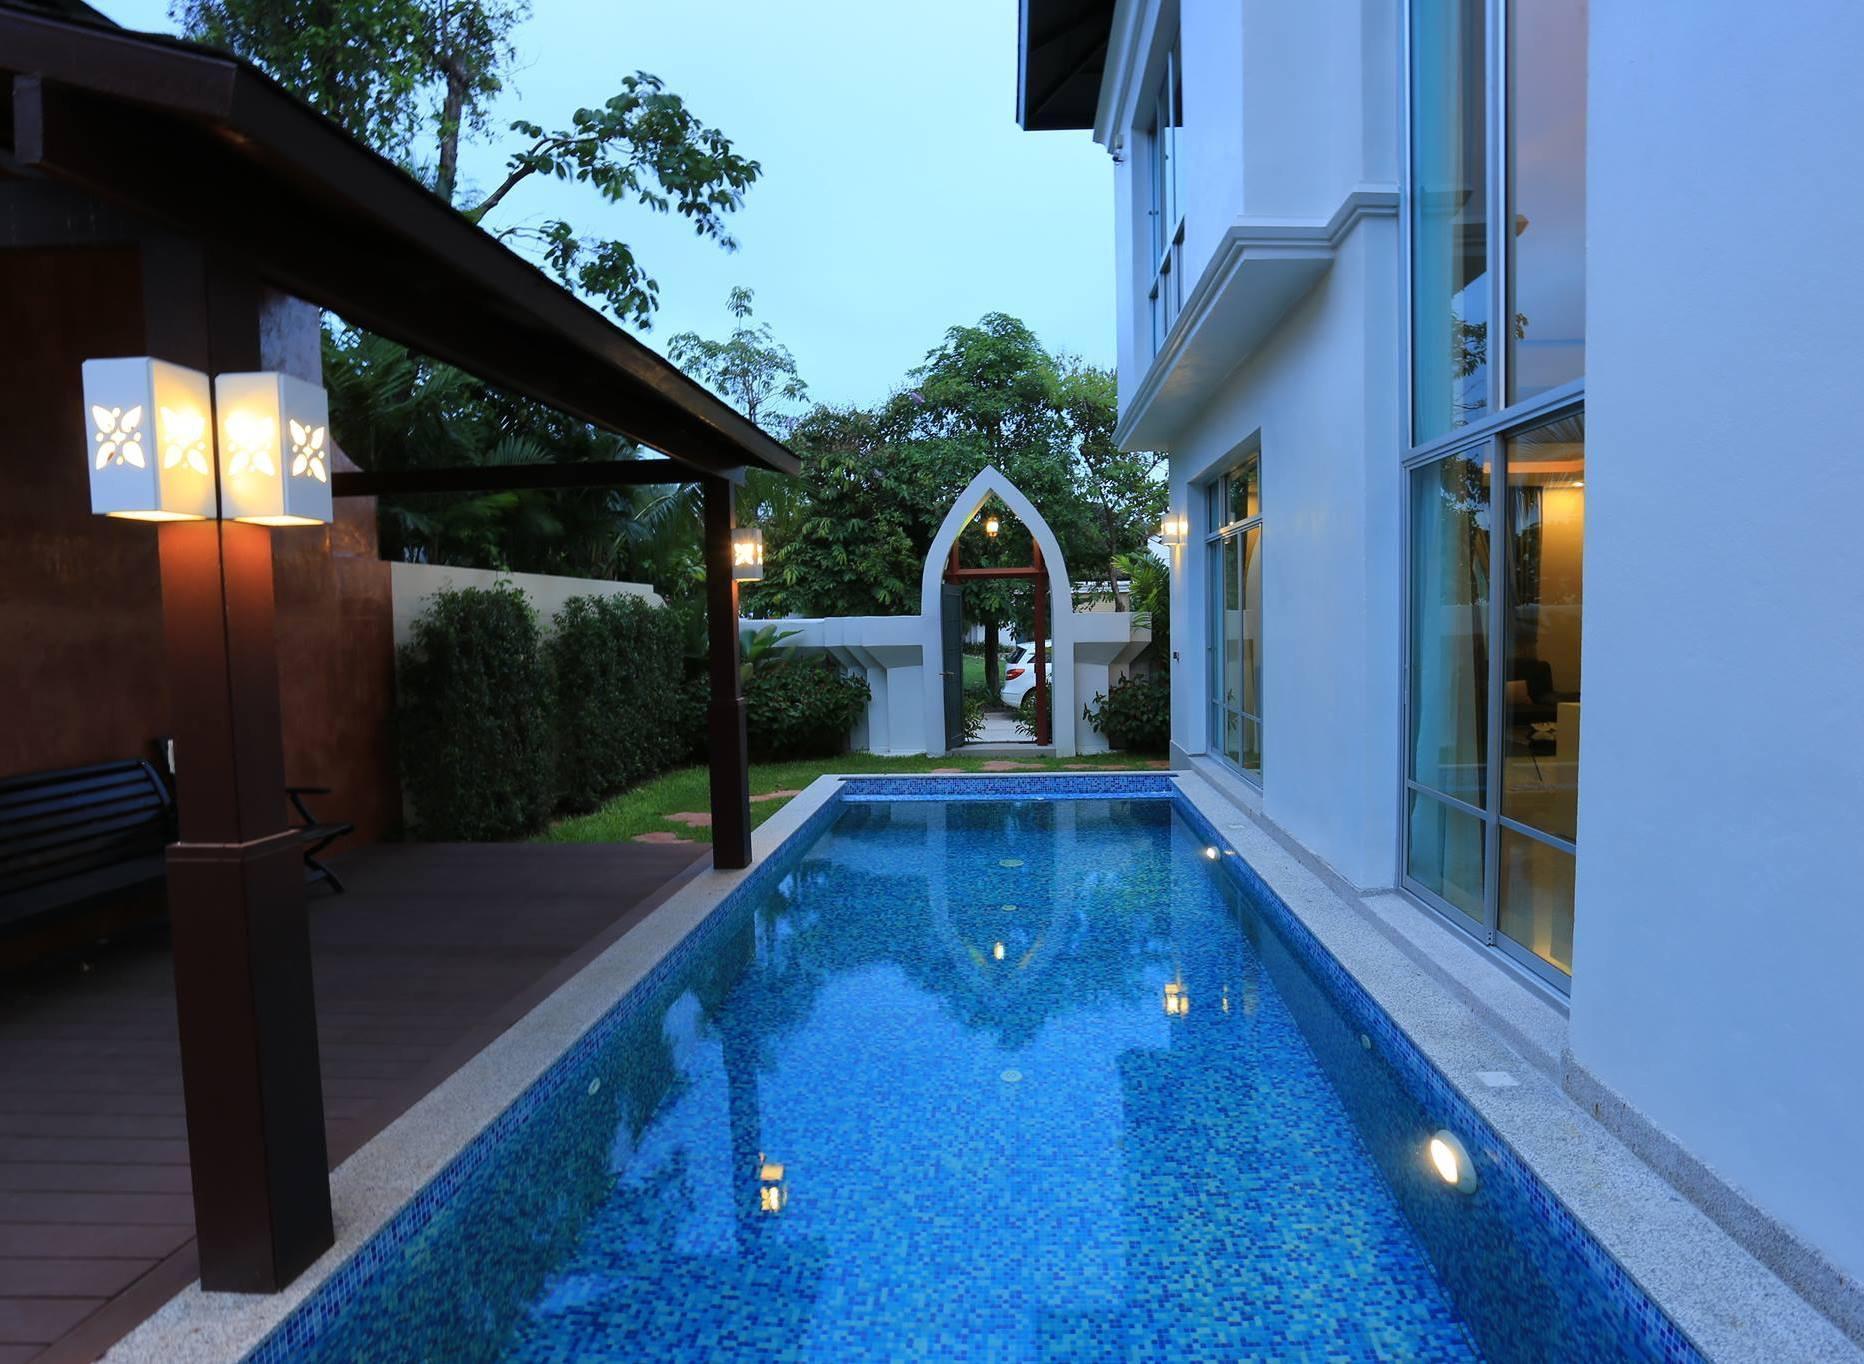 Siriwari Villas 11 BR Sleeps 22 w/Pool near City วิลลา 11 ห้องนอน 12 ห้องน้ำส่วนตัว ขนาด 840 ตร.ม. – พัทยาเหนือ